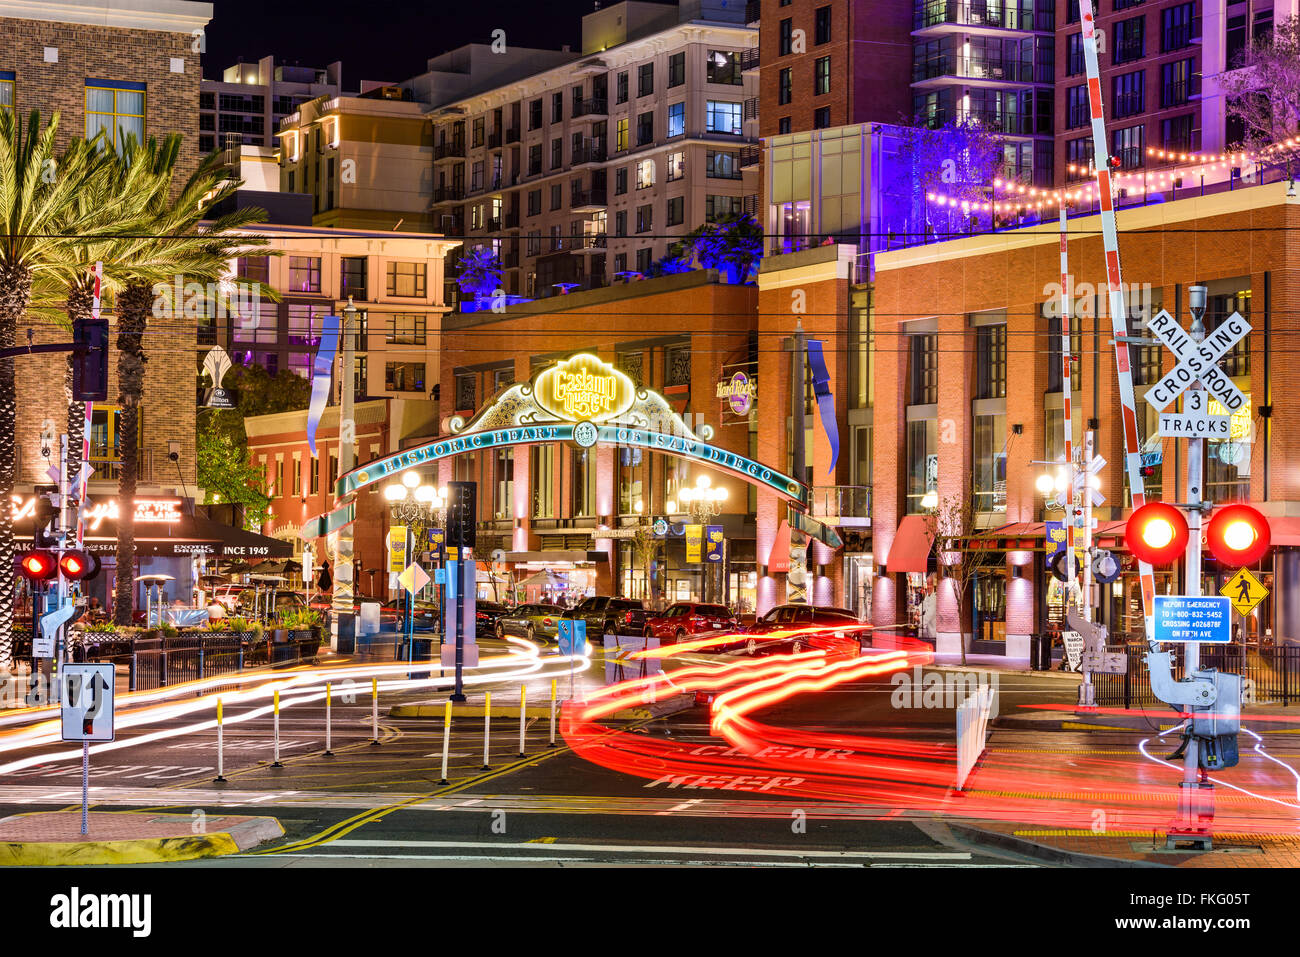 Gaslamp Quarter at night in San Diego, California, USA. Stock Photo